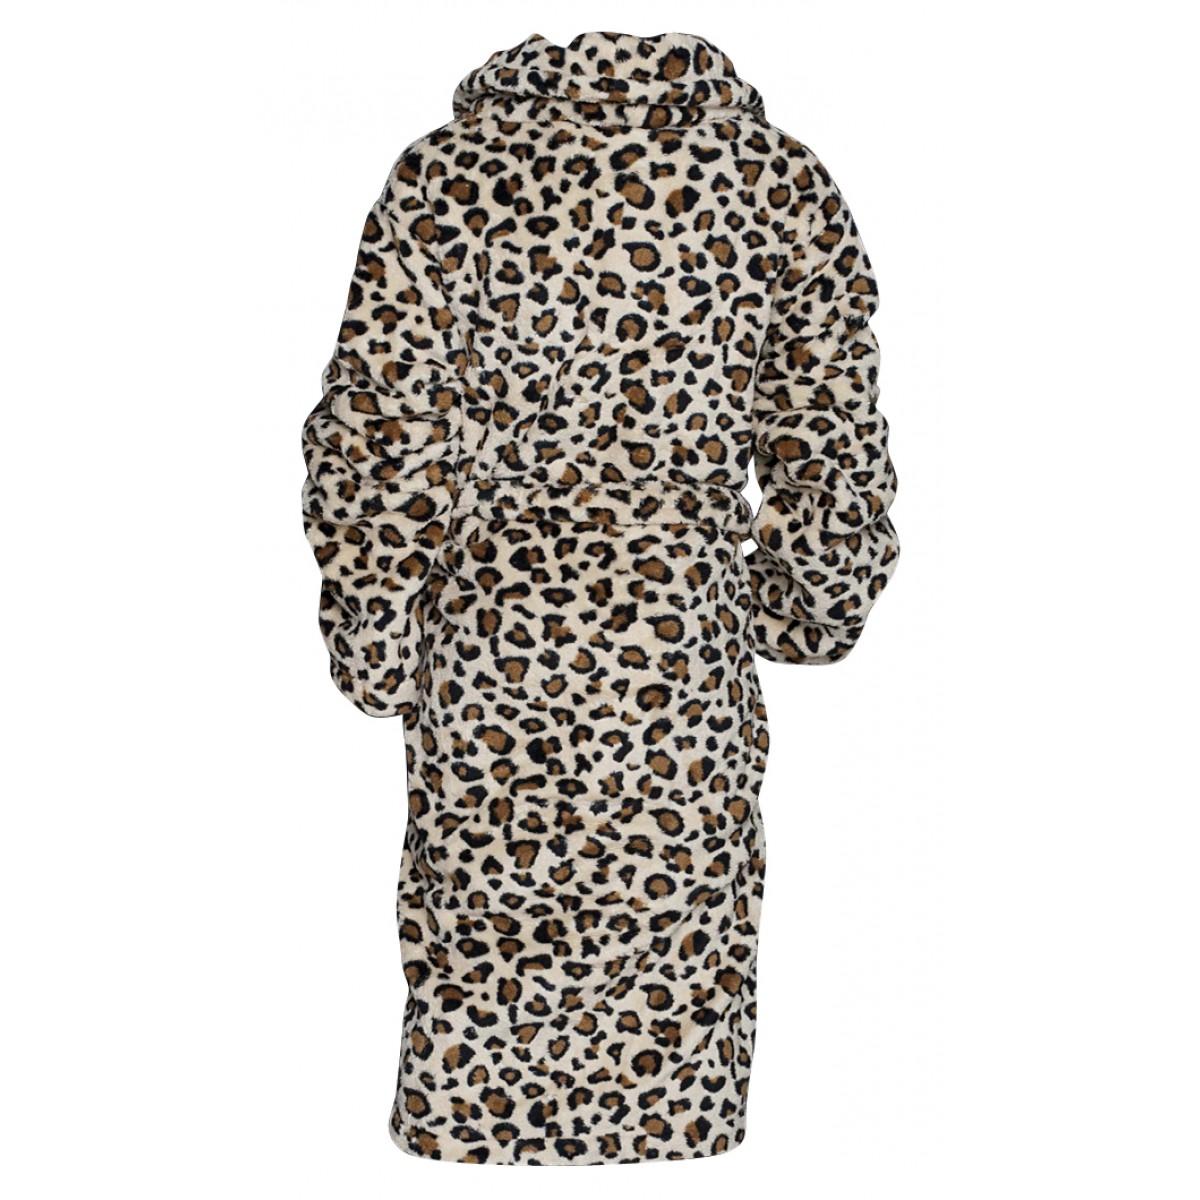 kinderbadjas-badjas fleece met print